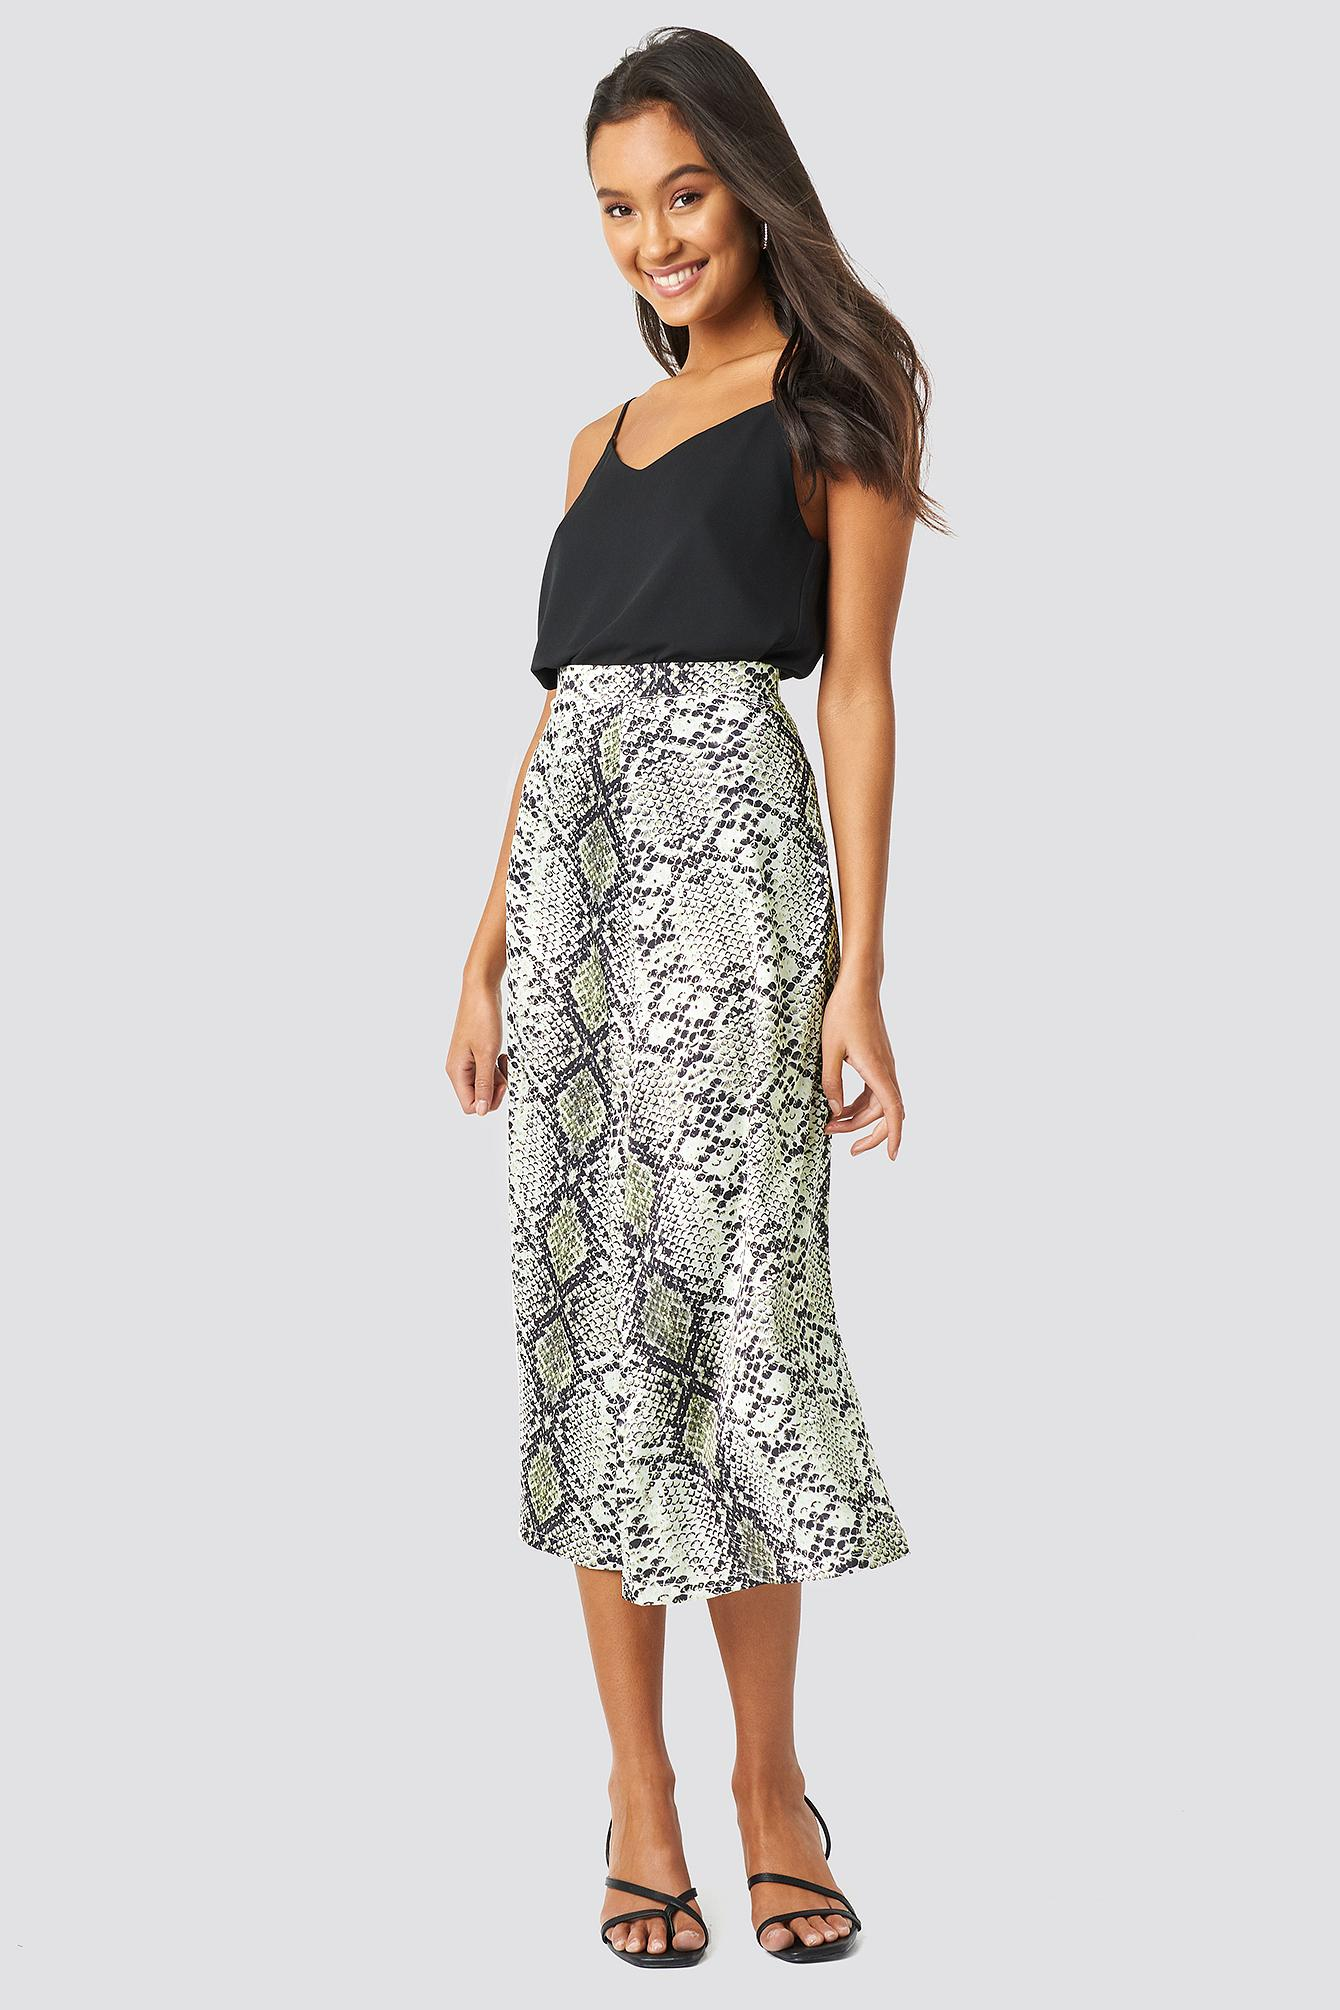 827aed1581 Trendyol Snake Patterned Skirt Gray in Gray - Lyst